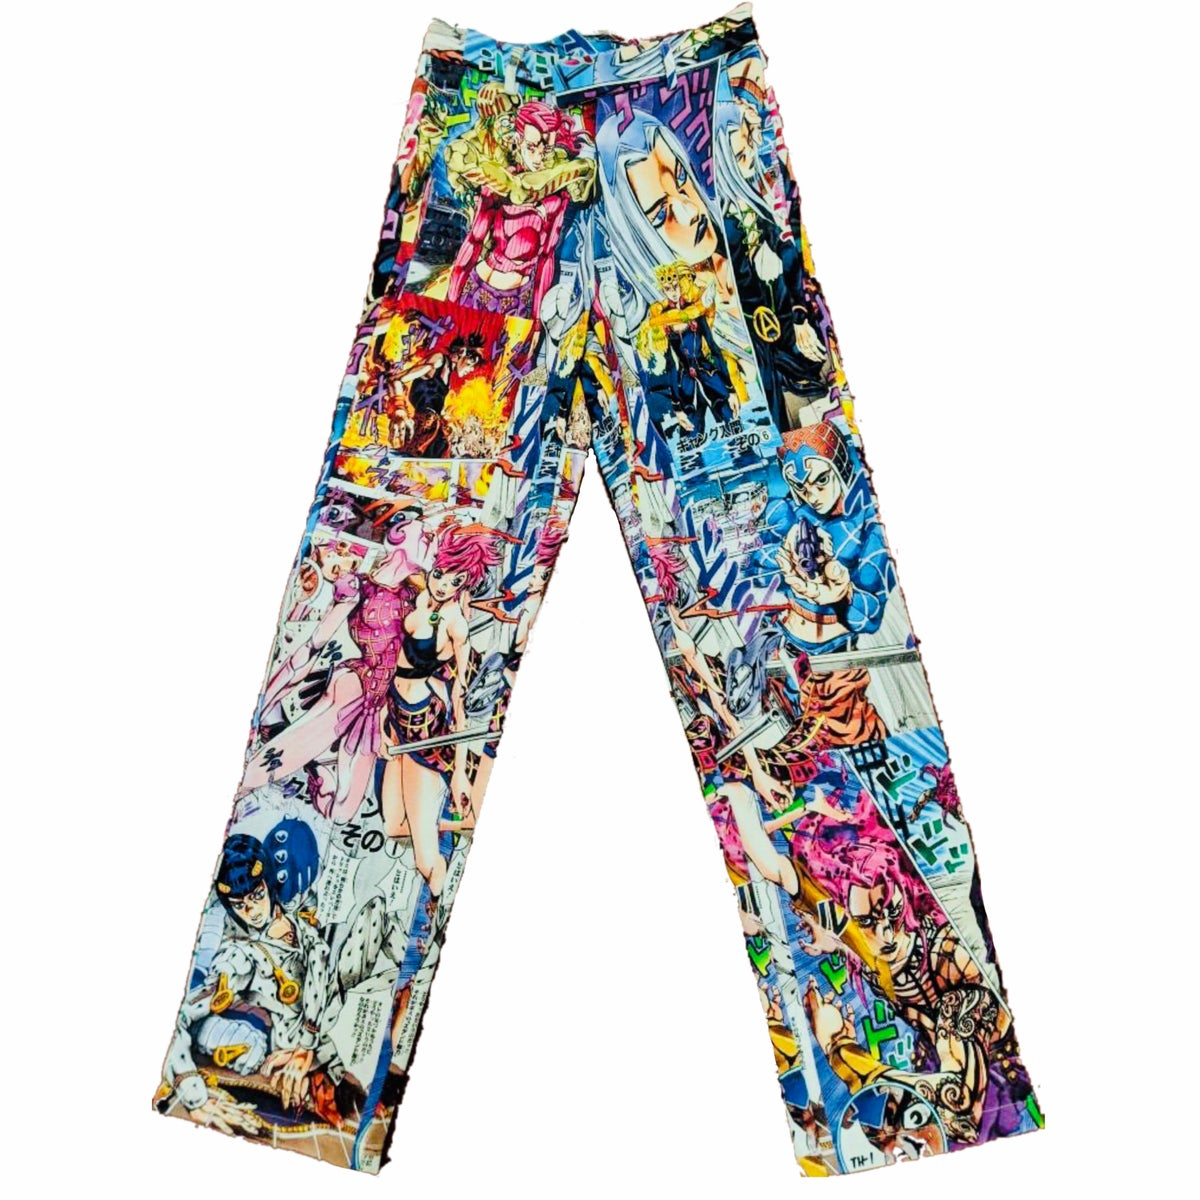 Image of Vento Aureo Pants